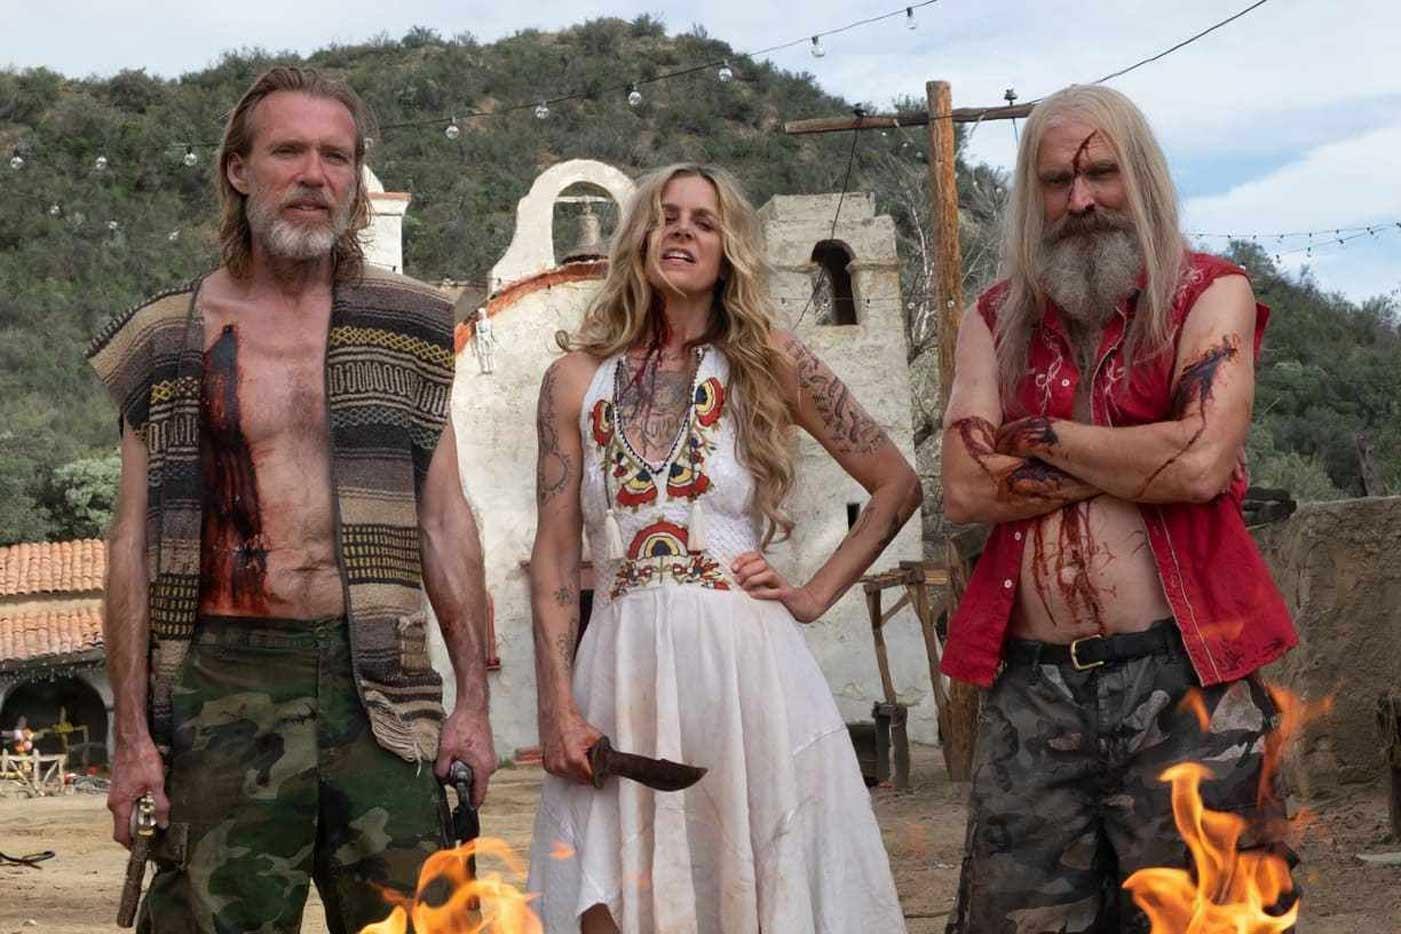 El Festival de Sitges 2019 arranca a ritmo de Glenn Danzig y Rob Zombie